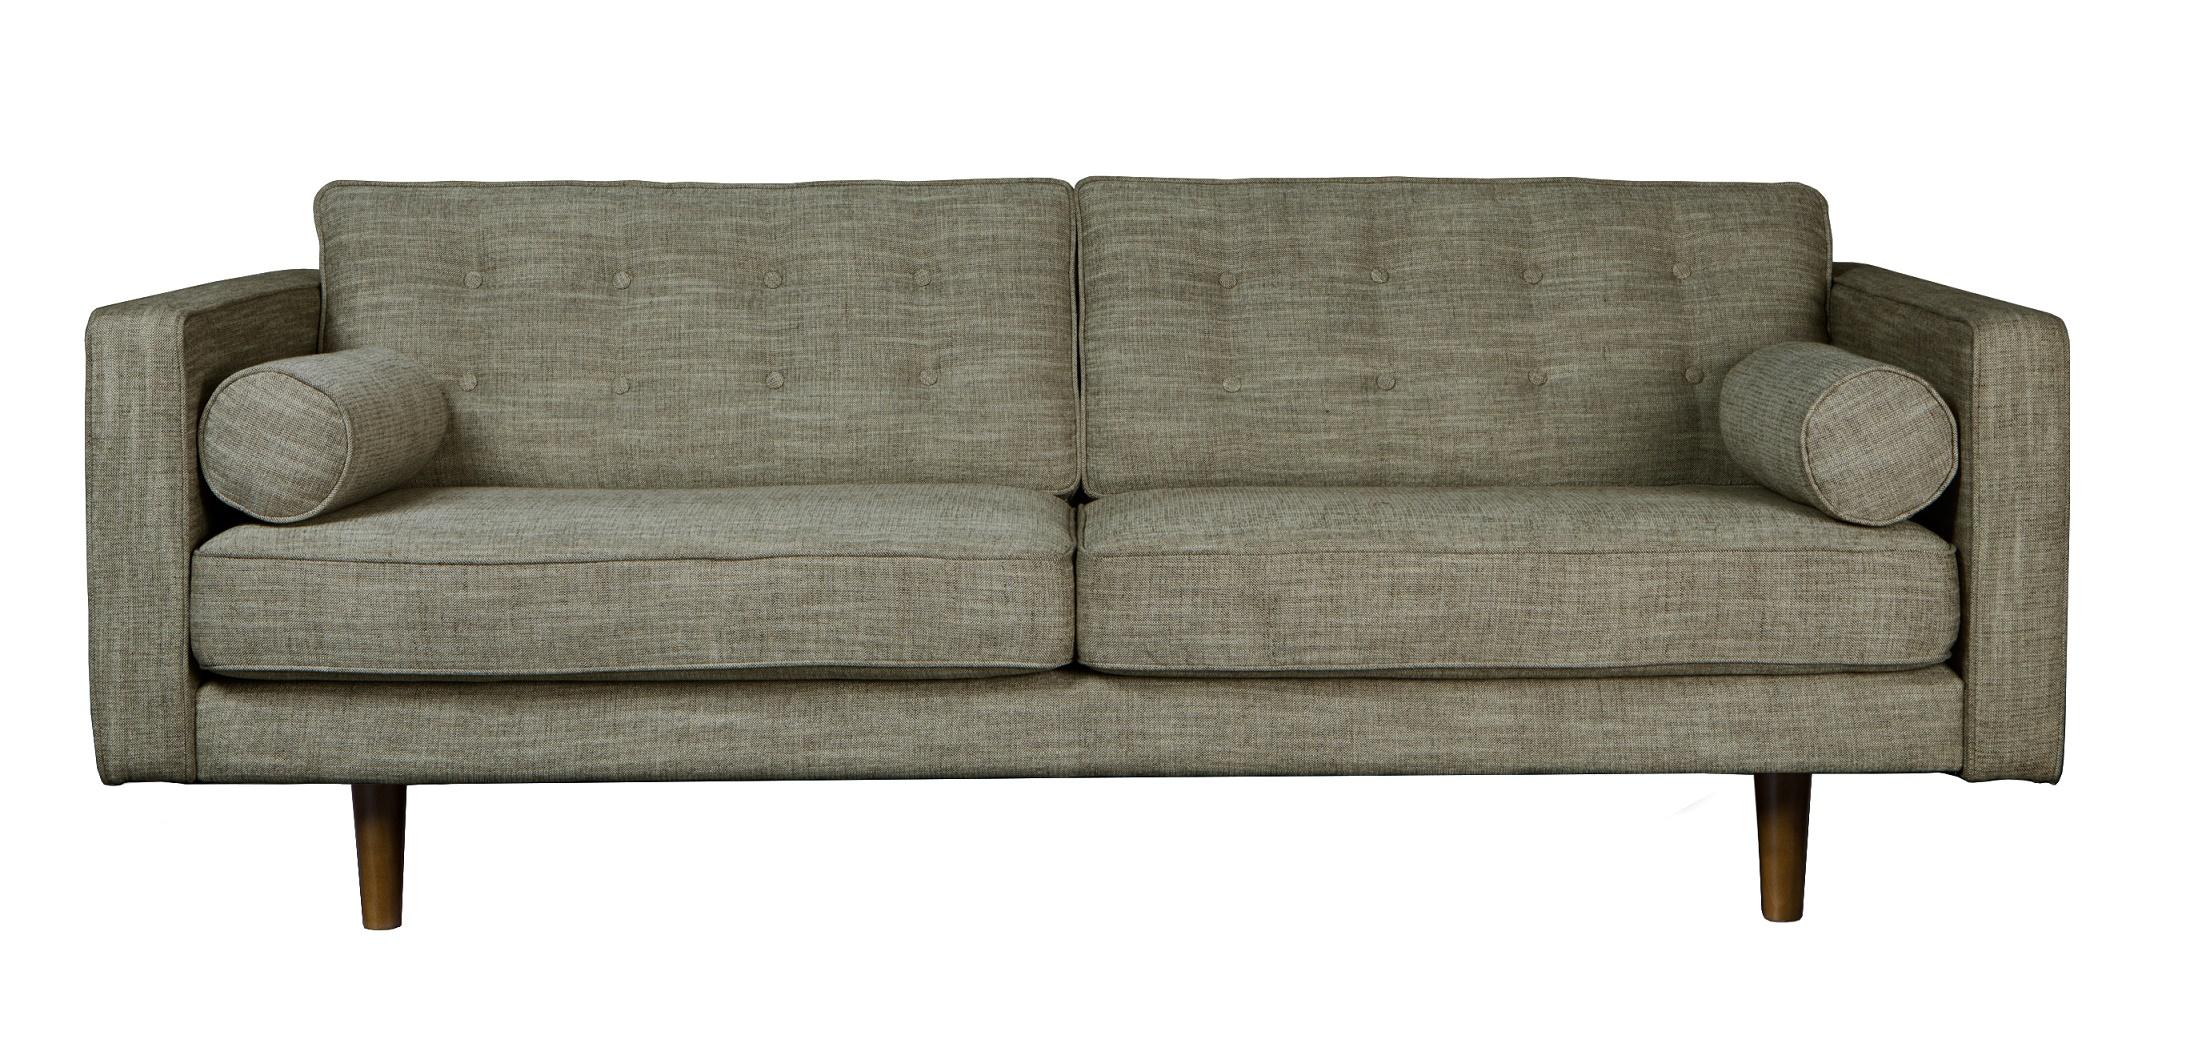 N101 large soffa